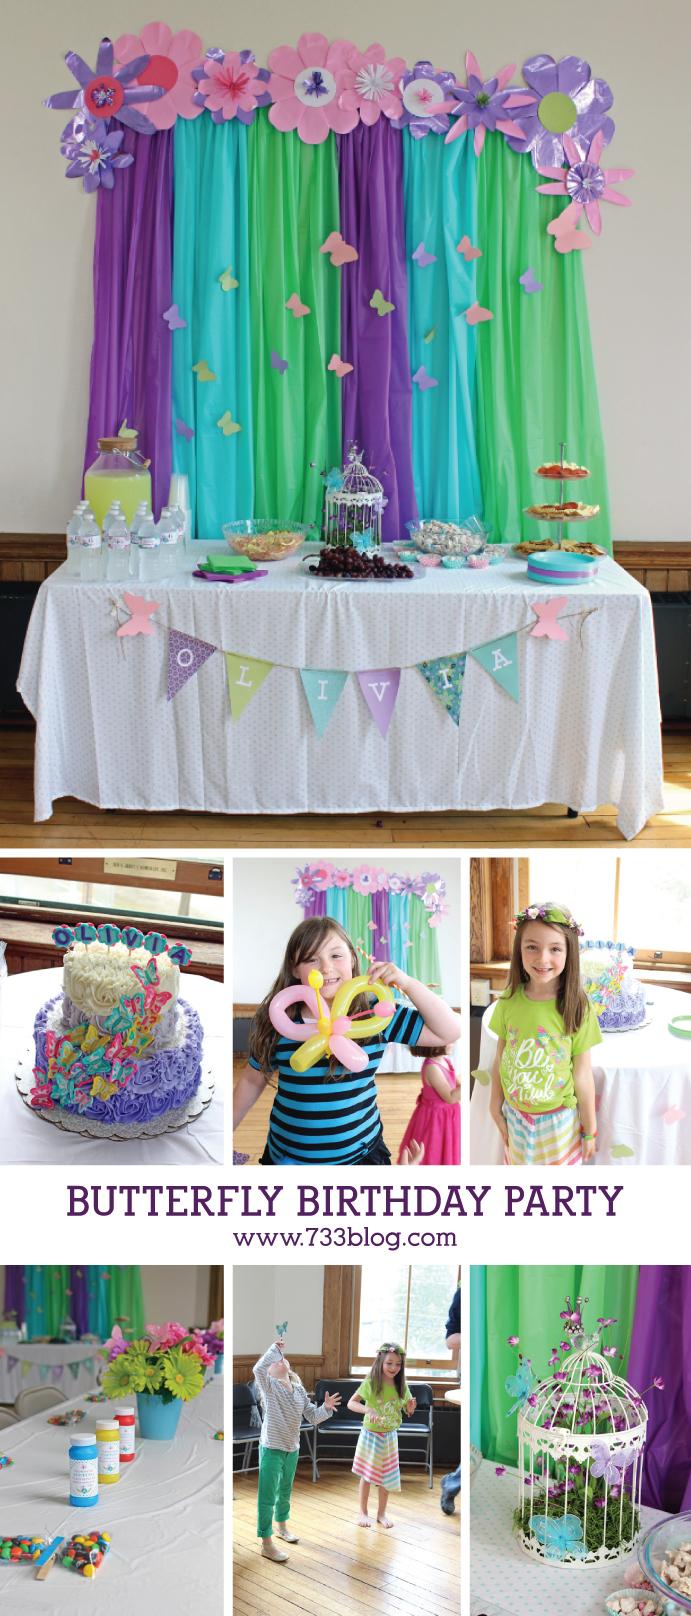 DIY Butterfly Birthday Party